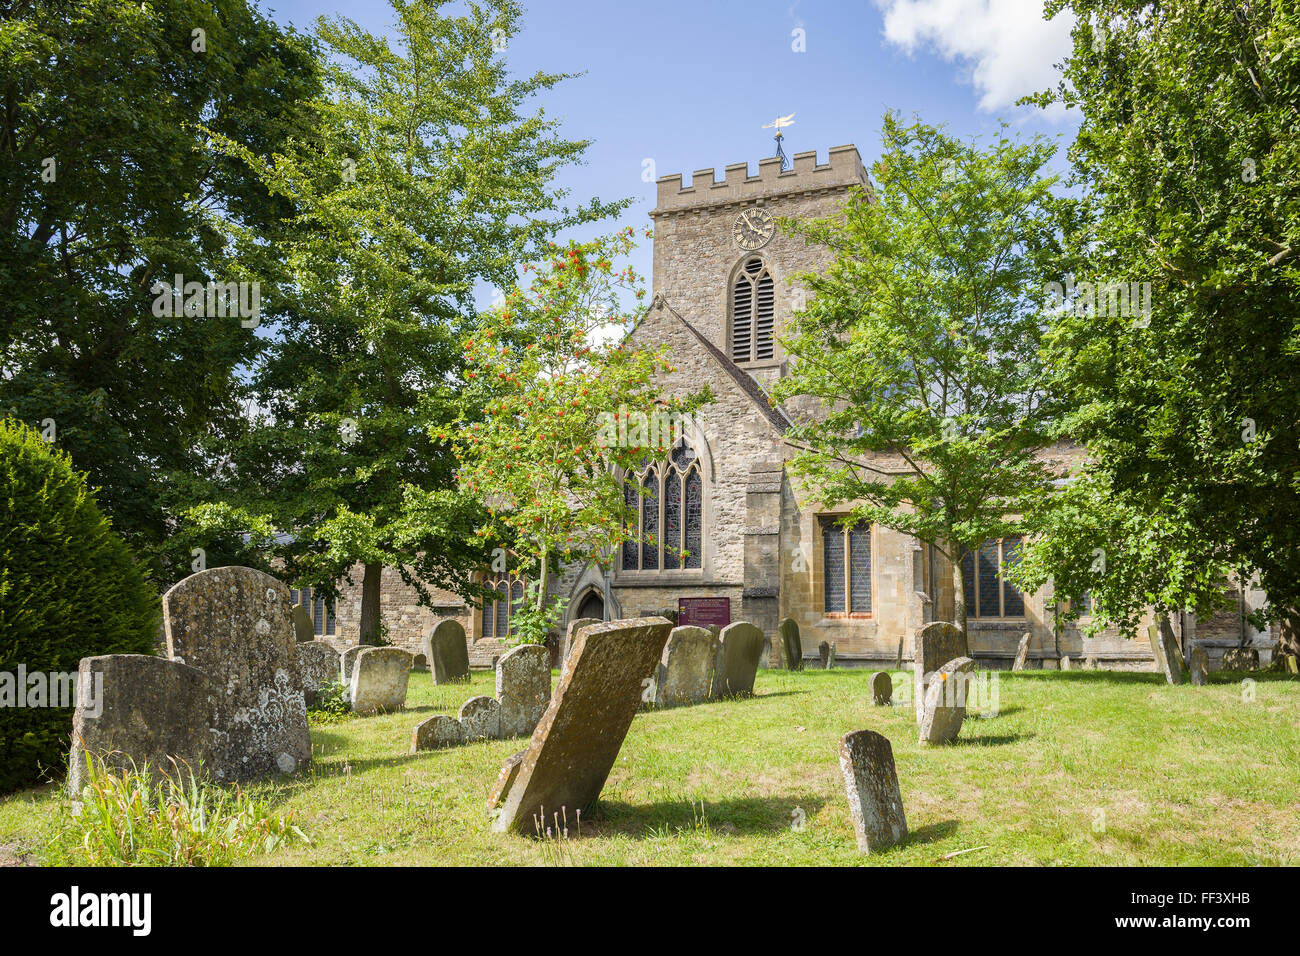 St Peter and St Paul Parish Church, Wantage, Oxfordshire, England, UK. Stock Photo